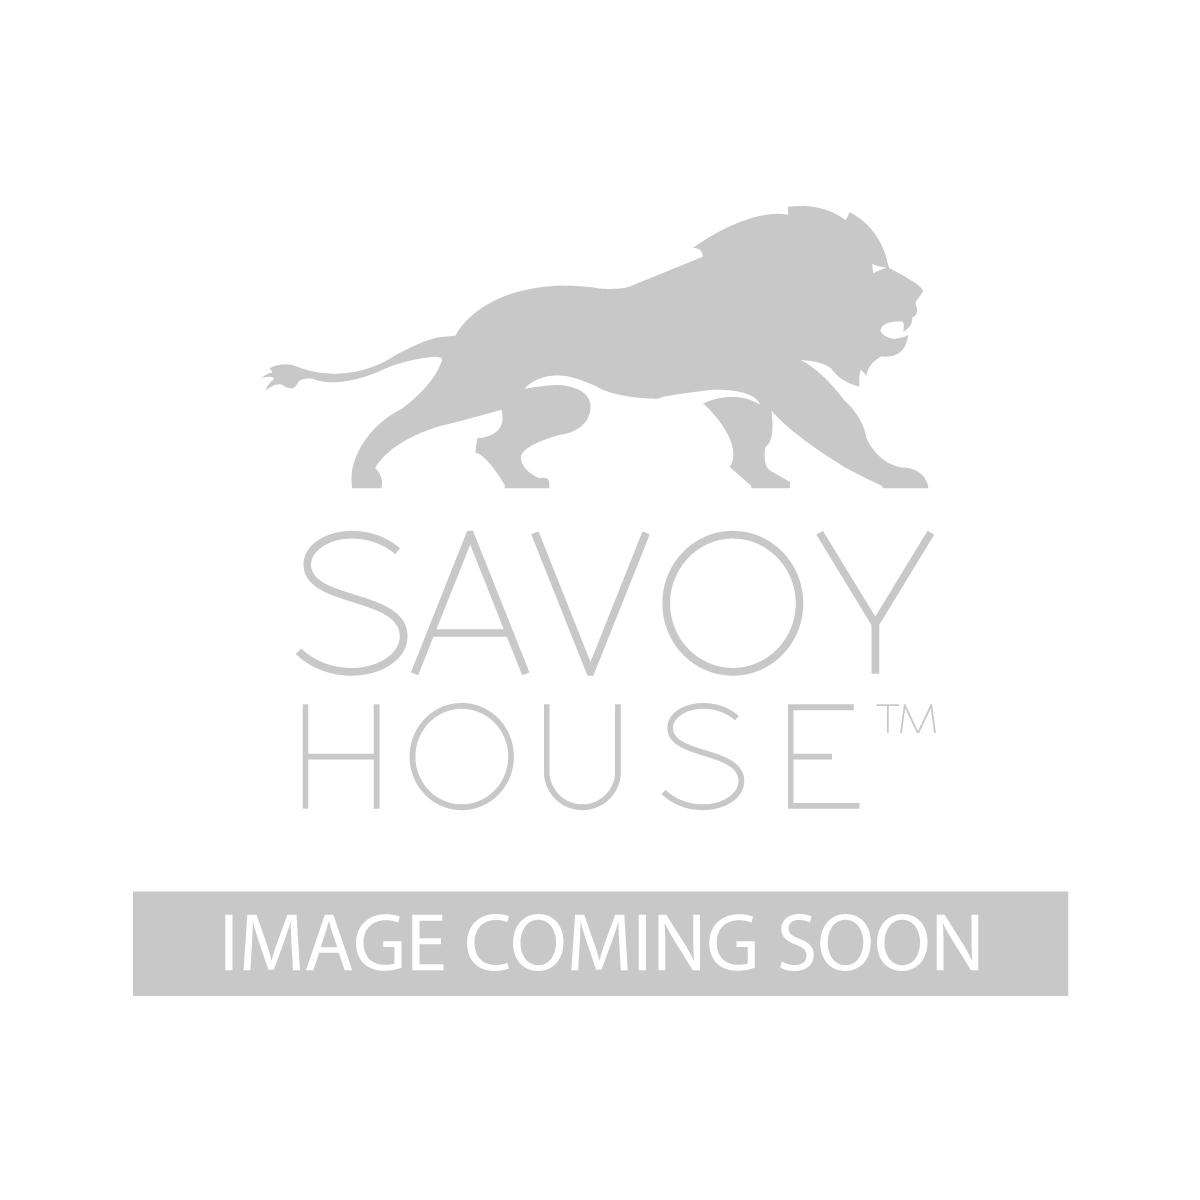 1 8075 3 Sn Scout 3 Light Semi Flush By Savoy House